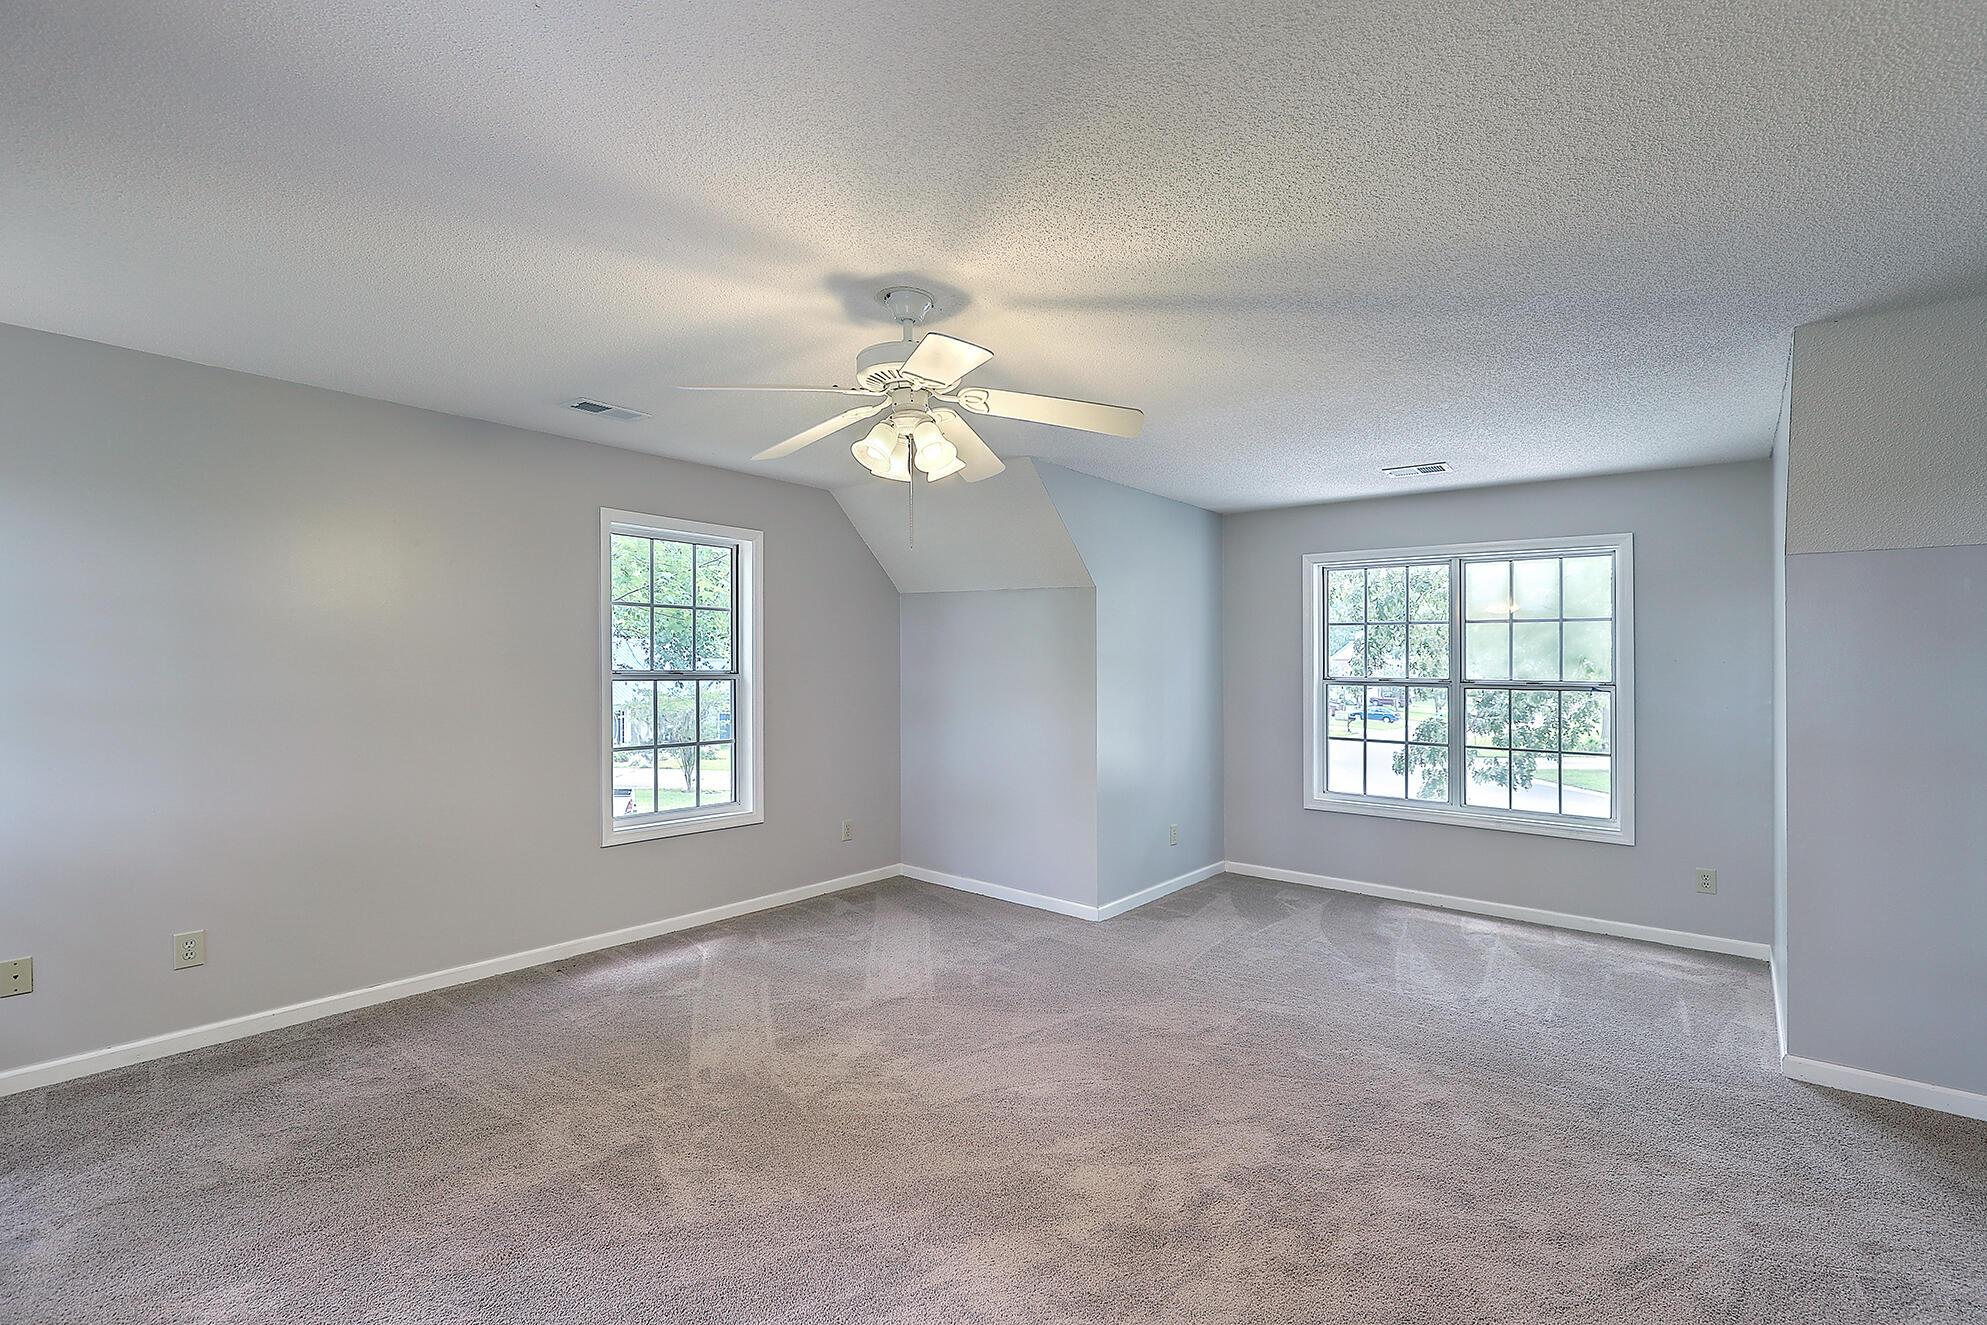 Appian Landing Homes For Sale - 8262 Longridge, North Charleston, SC - 0